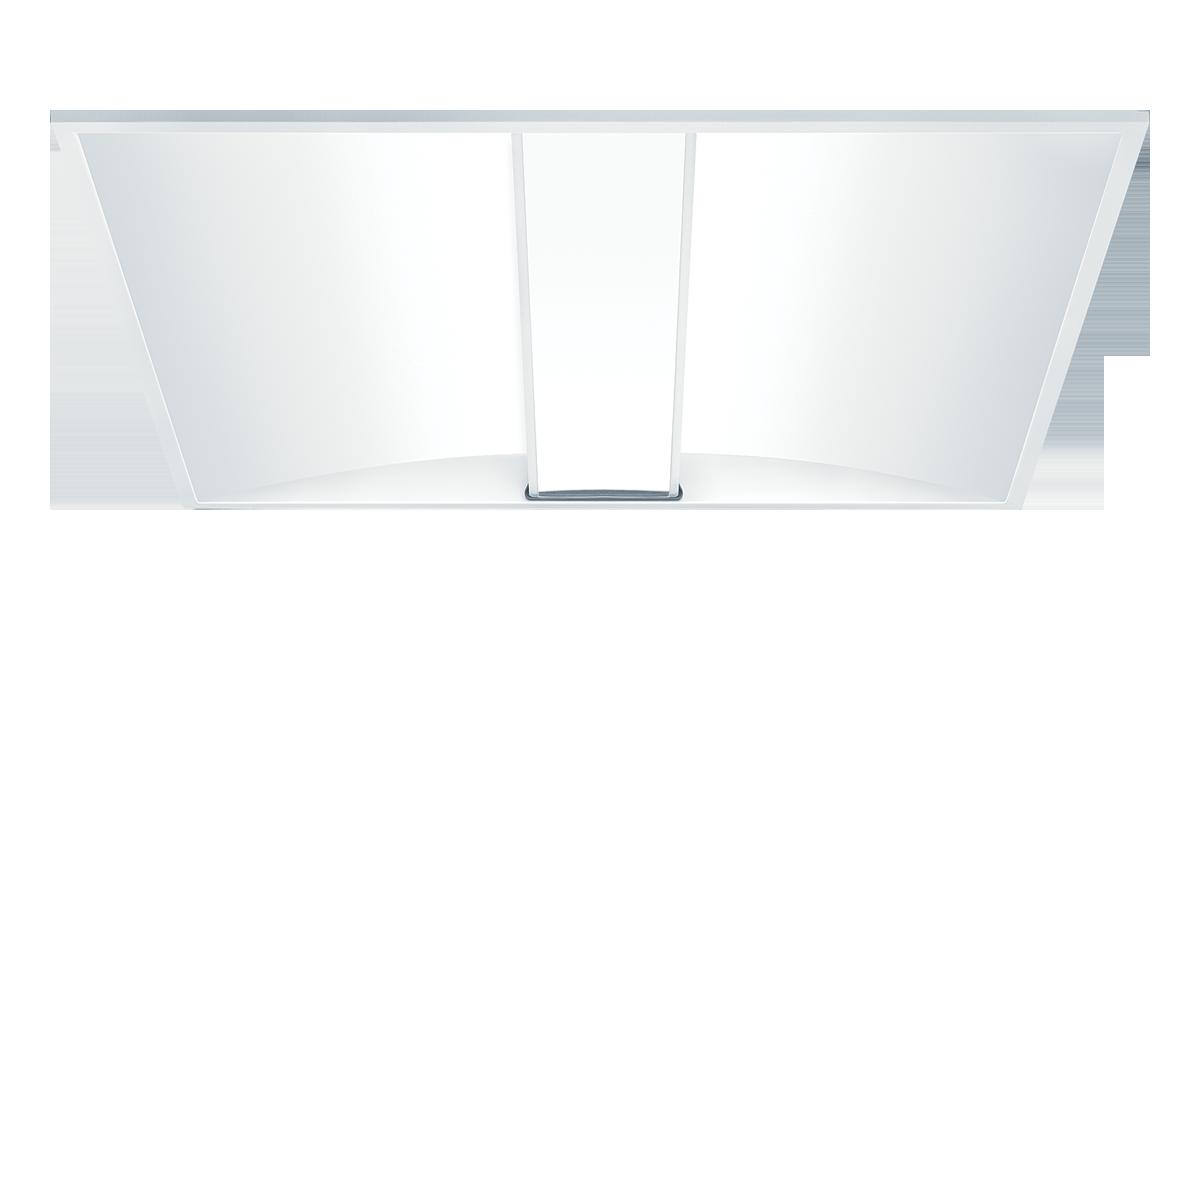 MELLOW LIGHT MELLOW LIGHT IV Recessed \ Split Diffuser Optic 2' x 2'